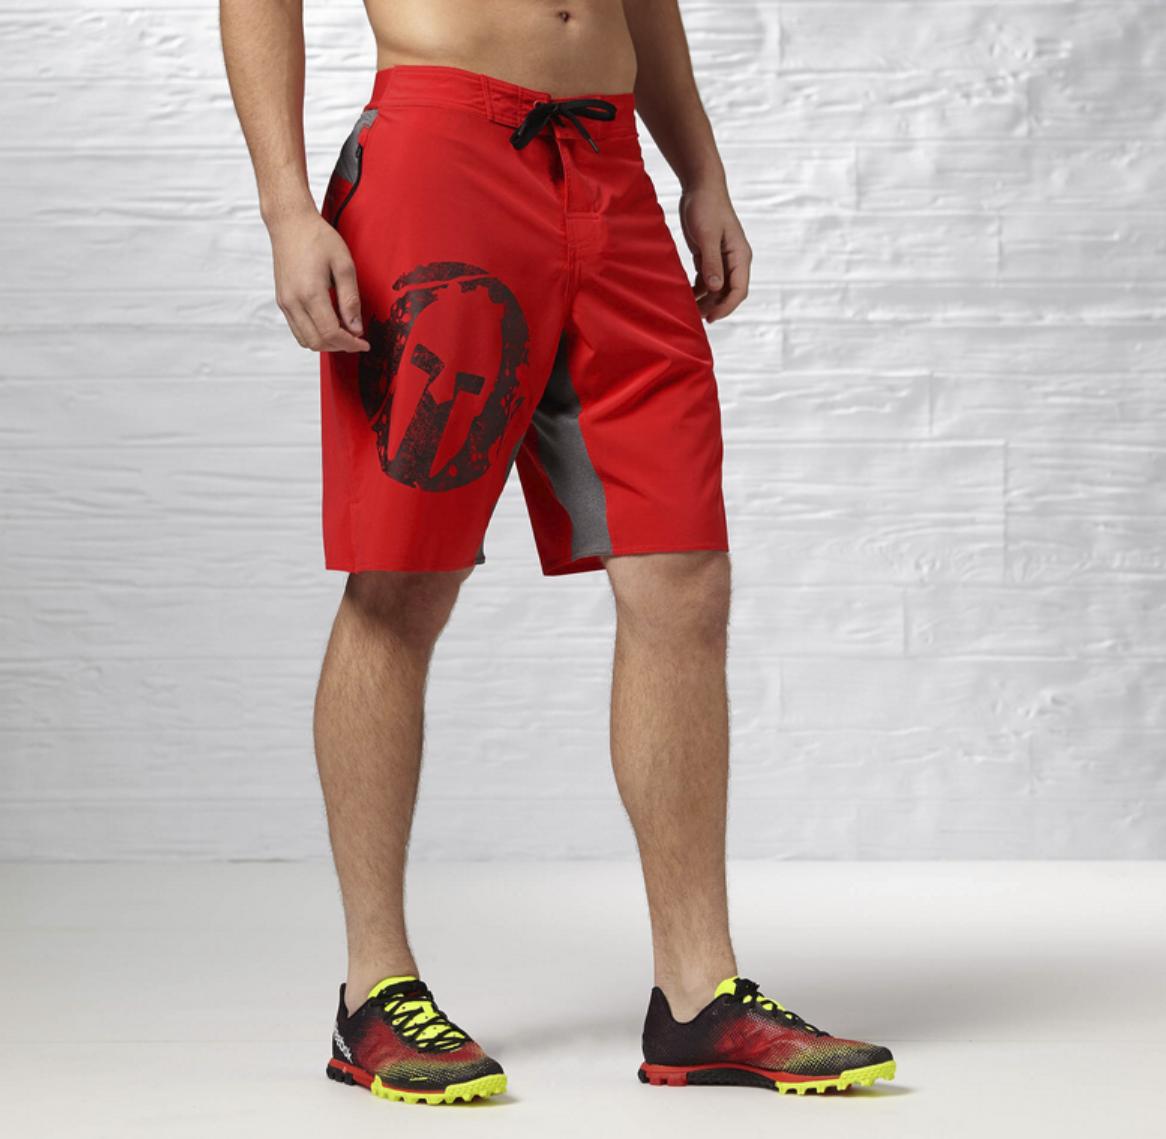 01956afeb0 Spartan Race Men's Board Shorts   Clothing   Spartan race, Mens ...